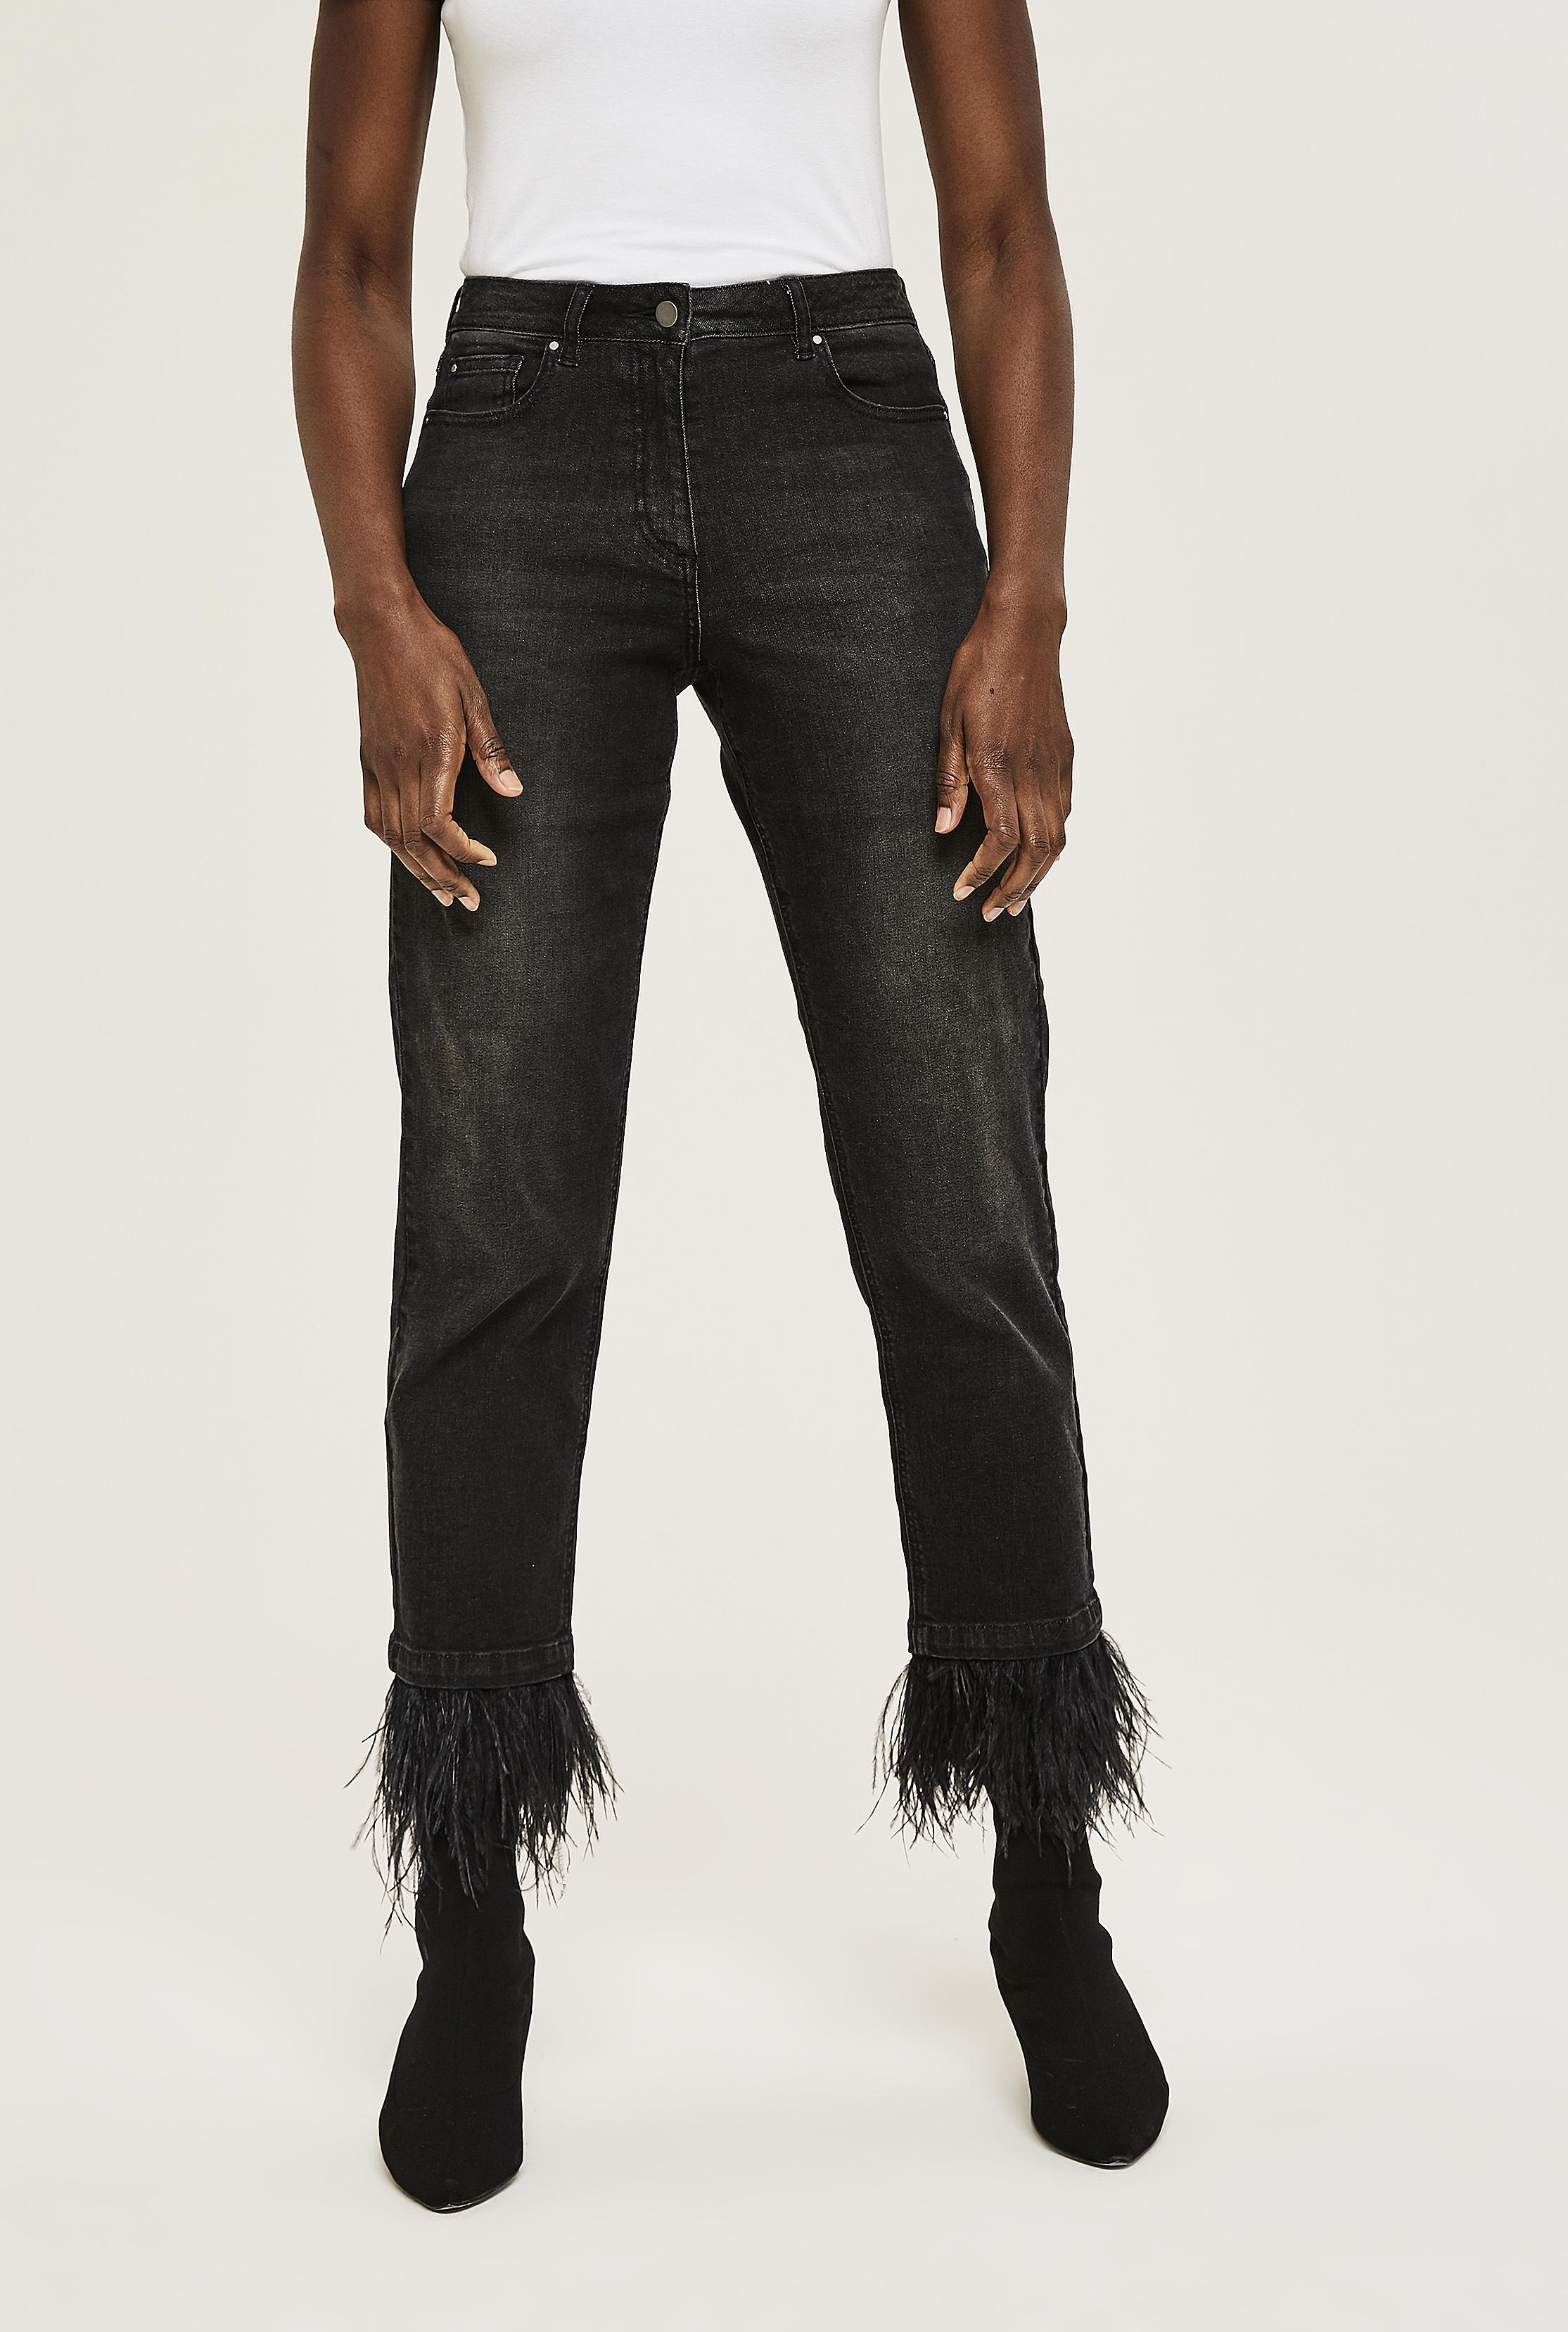 Feather Trim Ankle Grazer Jean